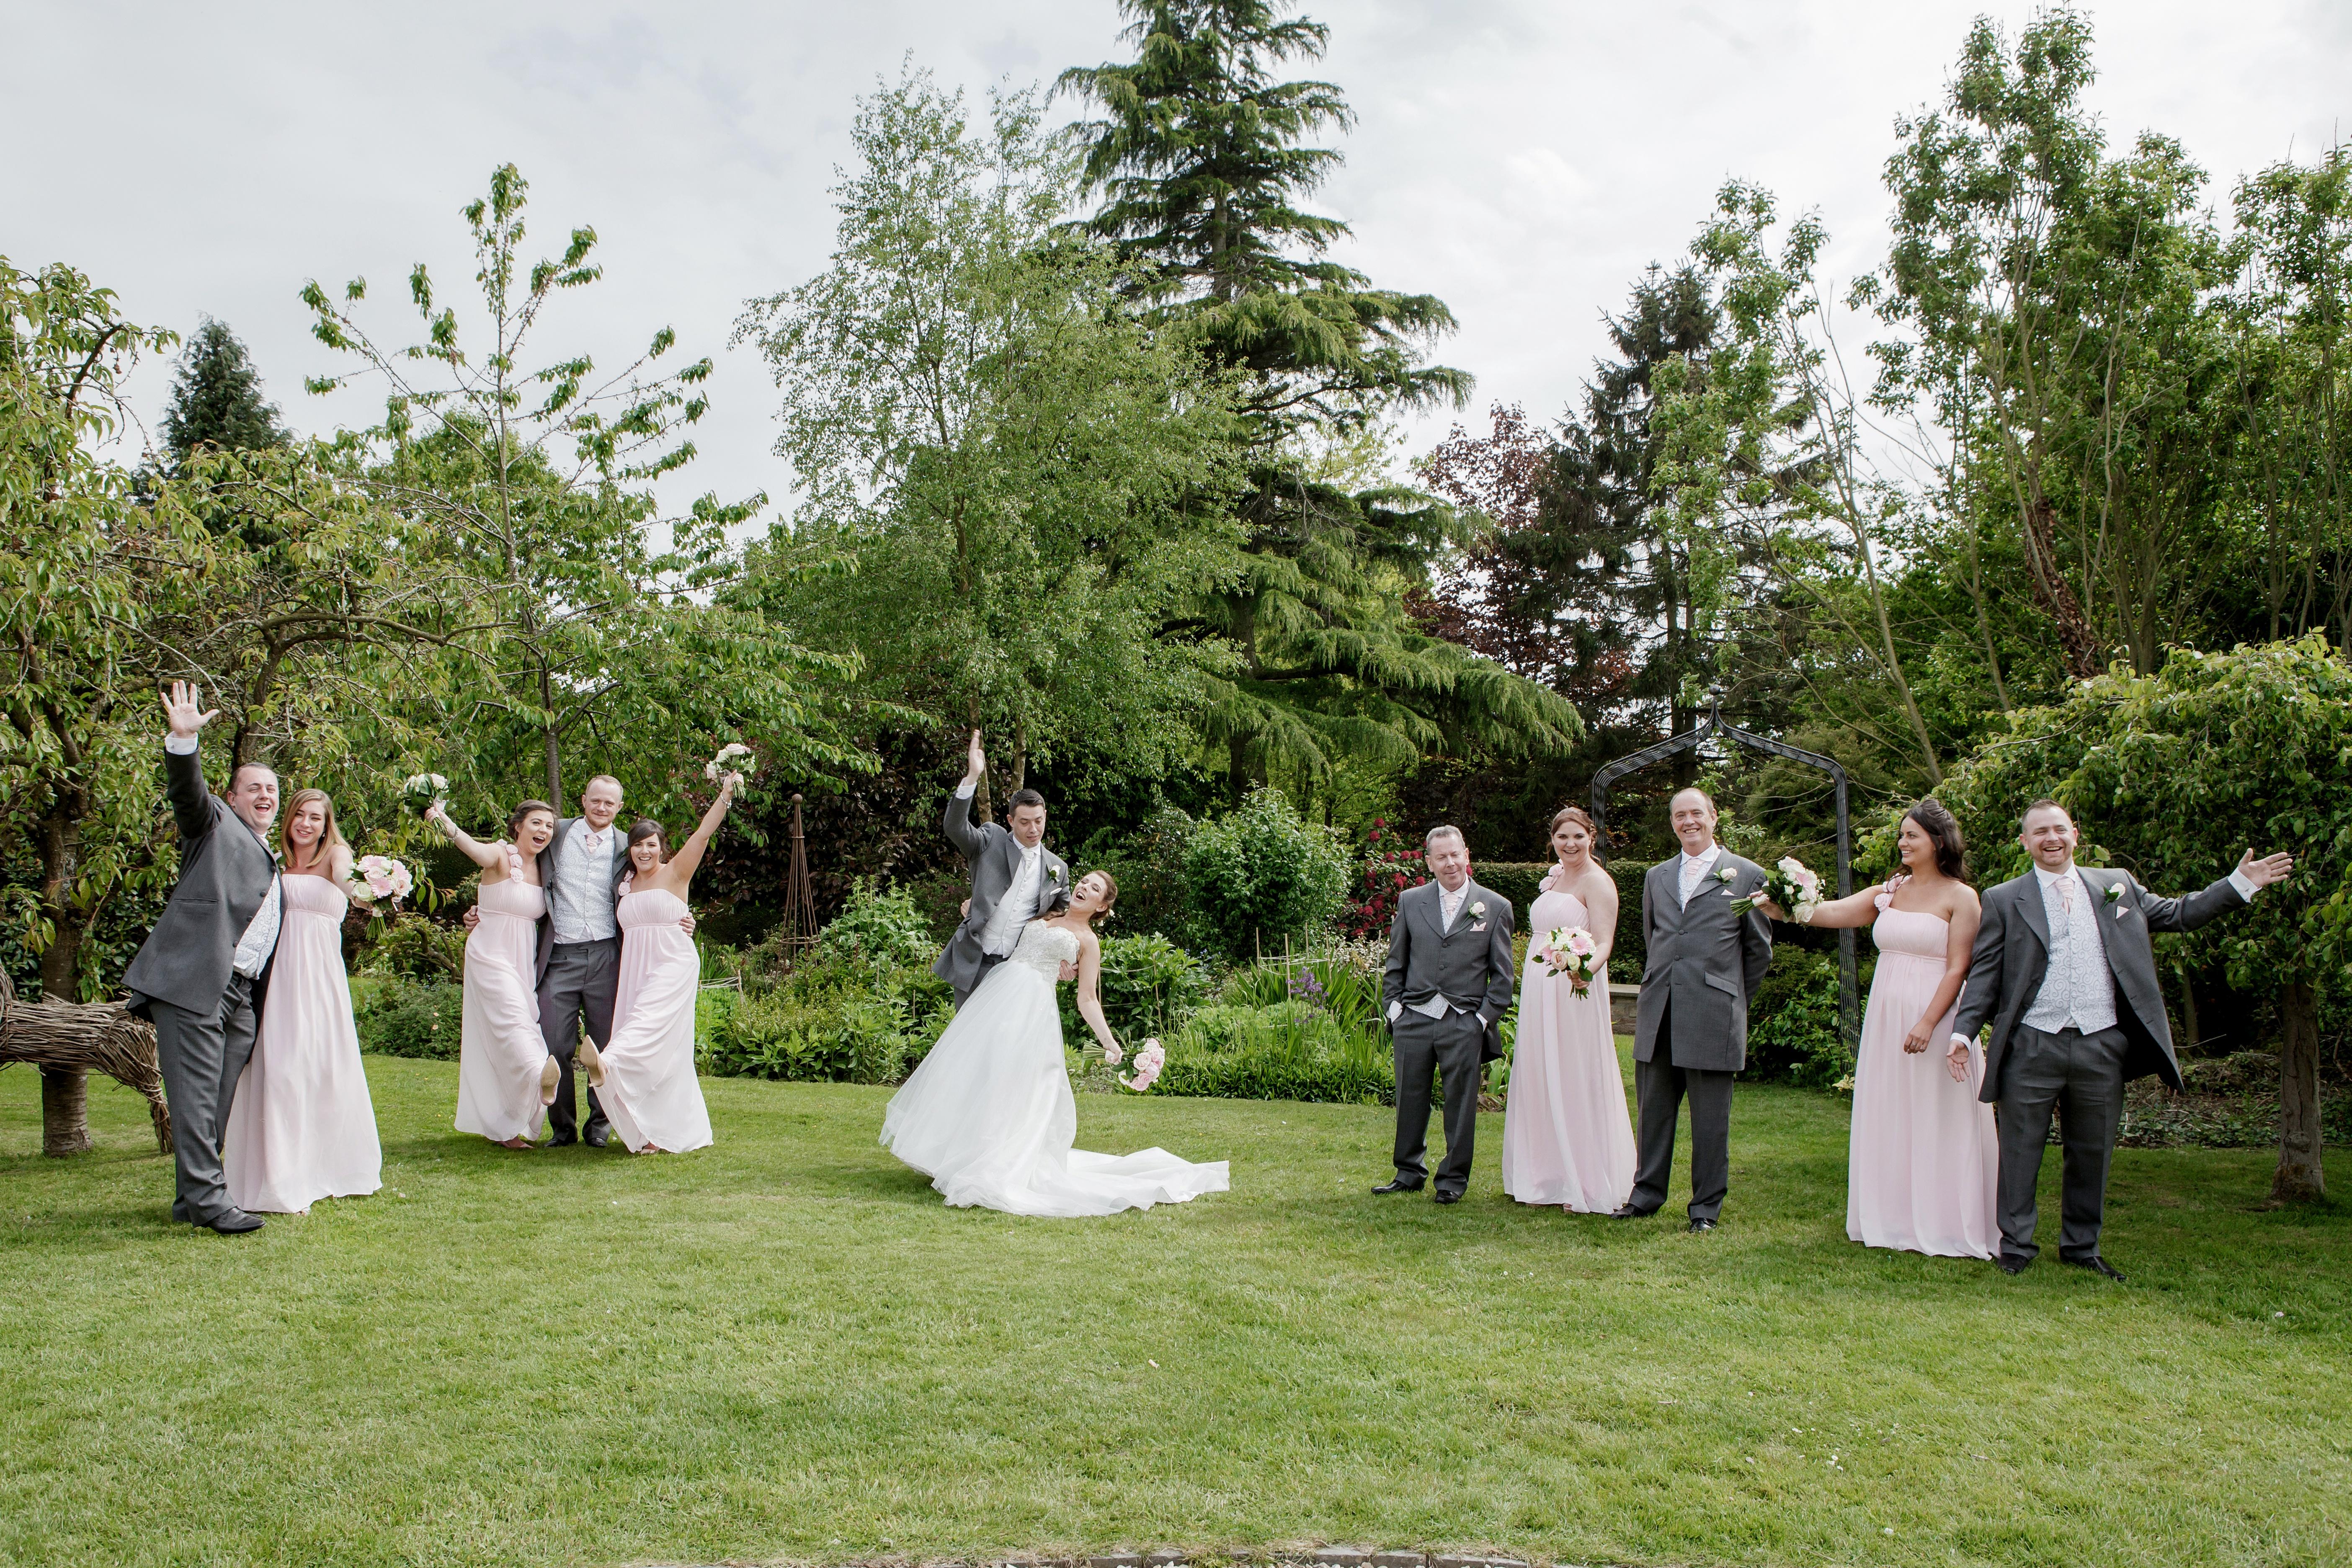 Shattle-Hall-wedding-photographer-RD-Elen-Studio-Photography-370